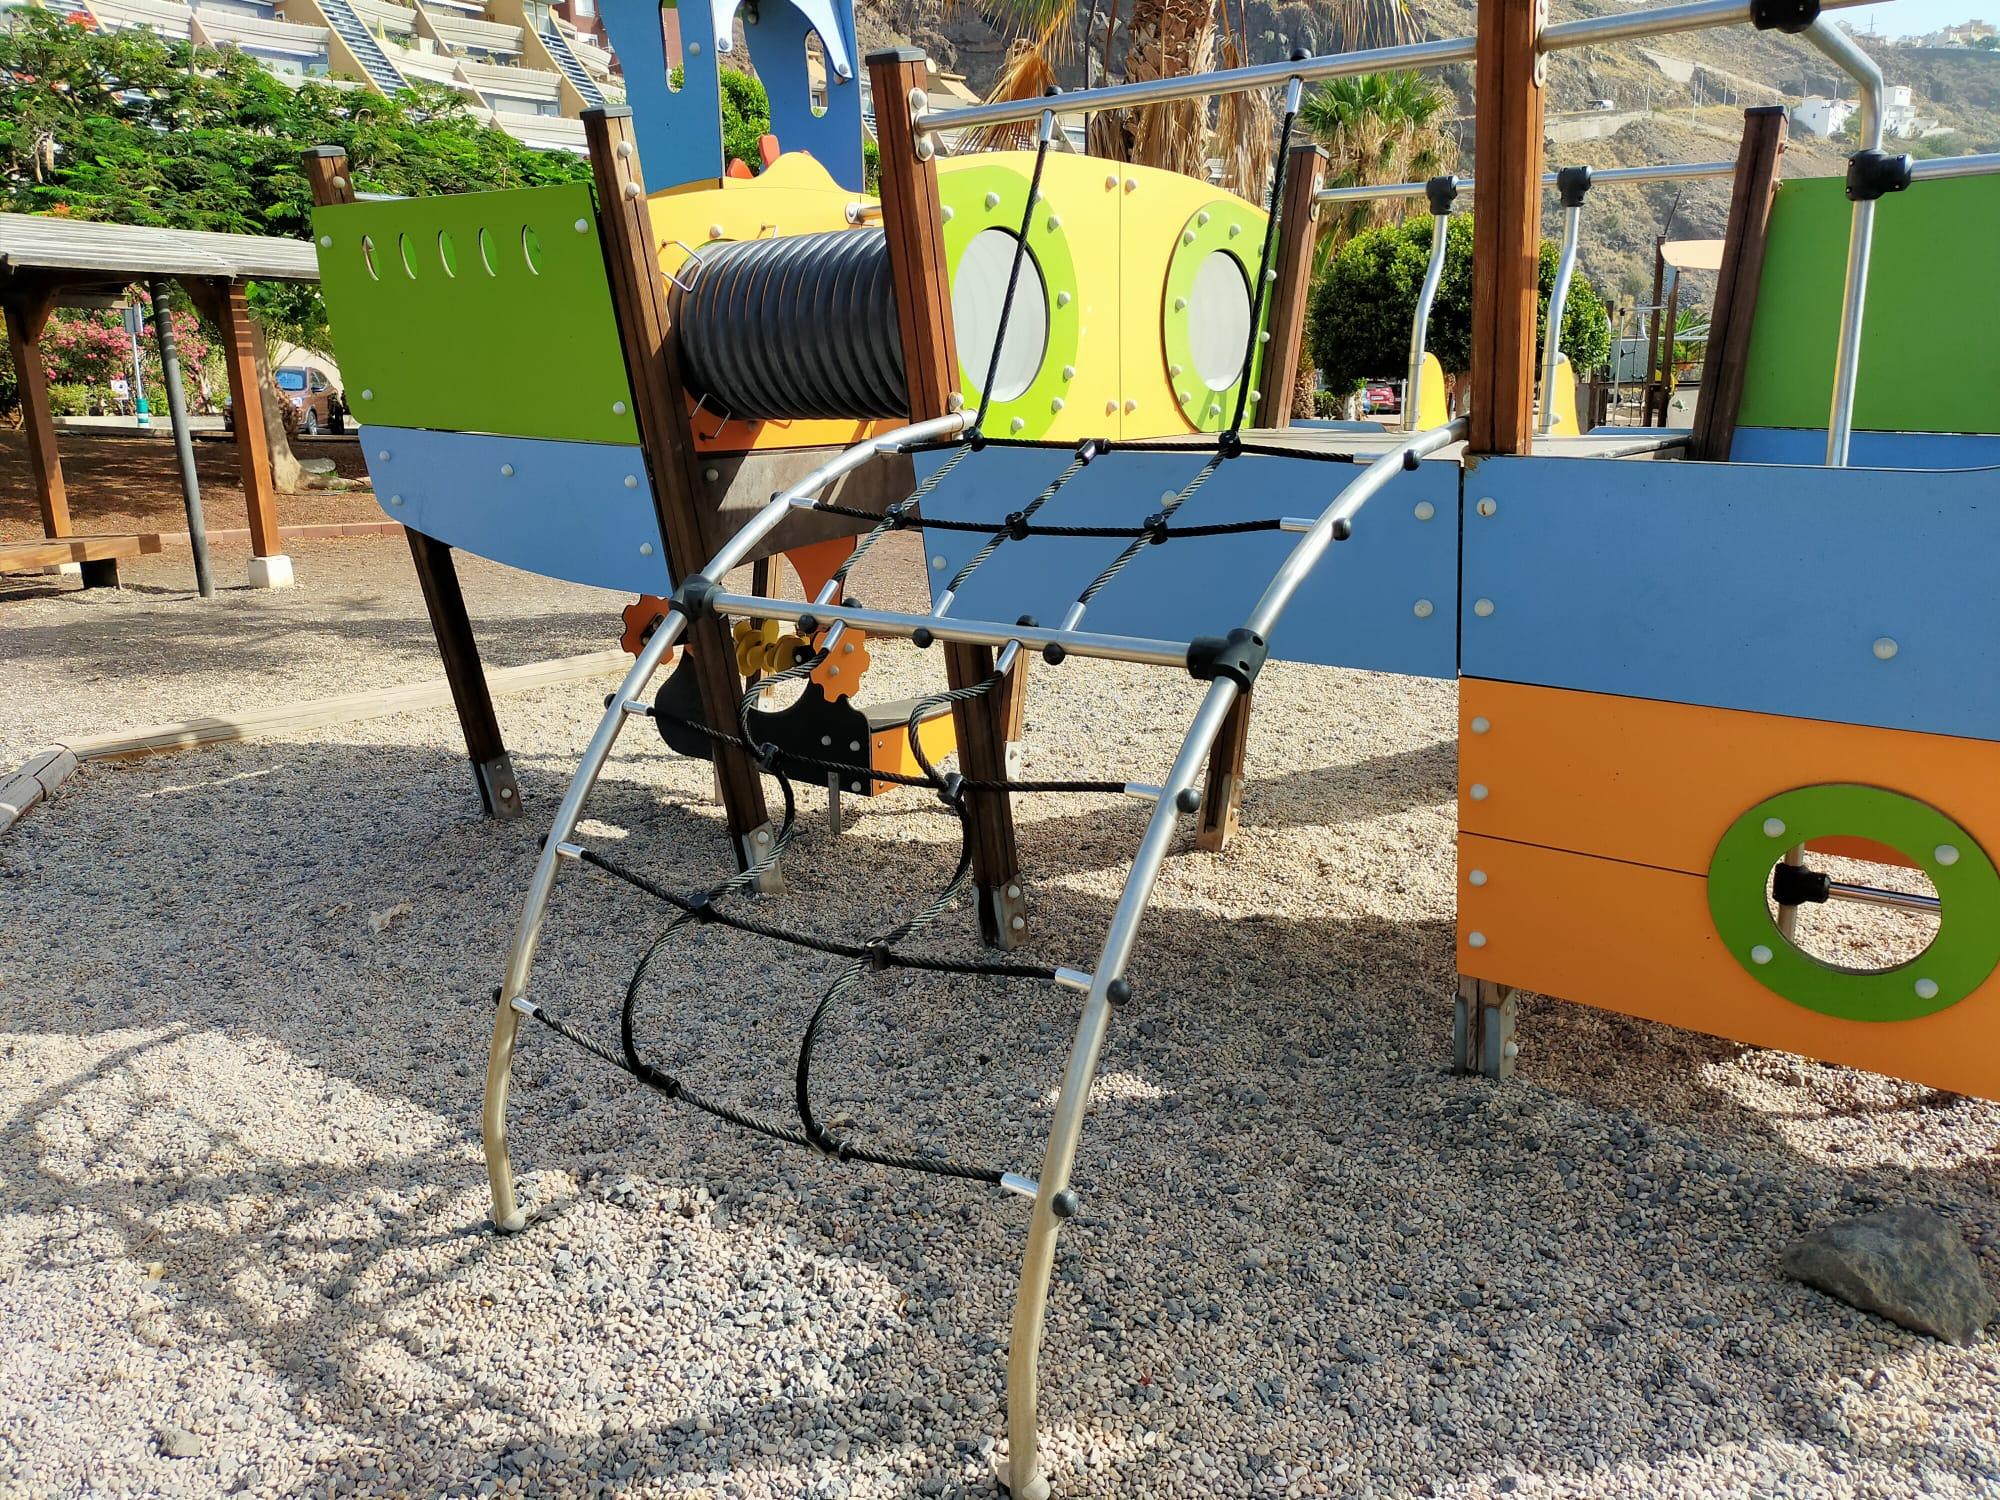 Mejora seguridad parque infantil de Guadamojete (2)